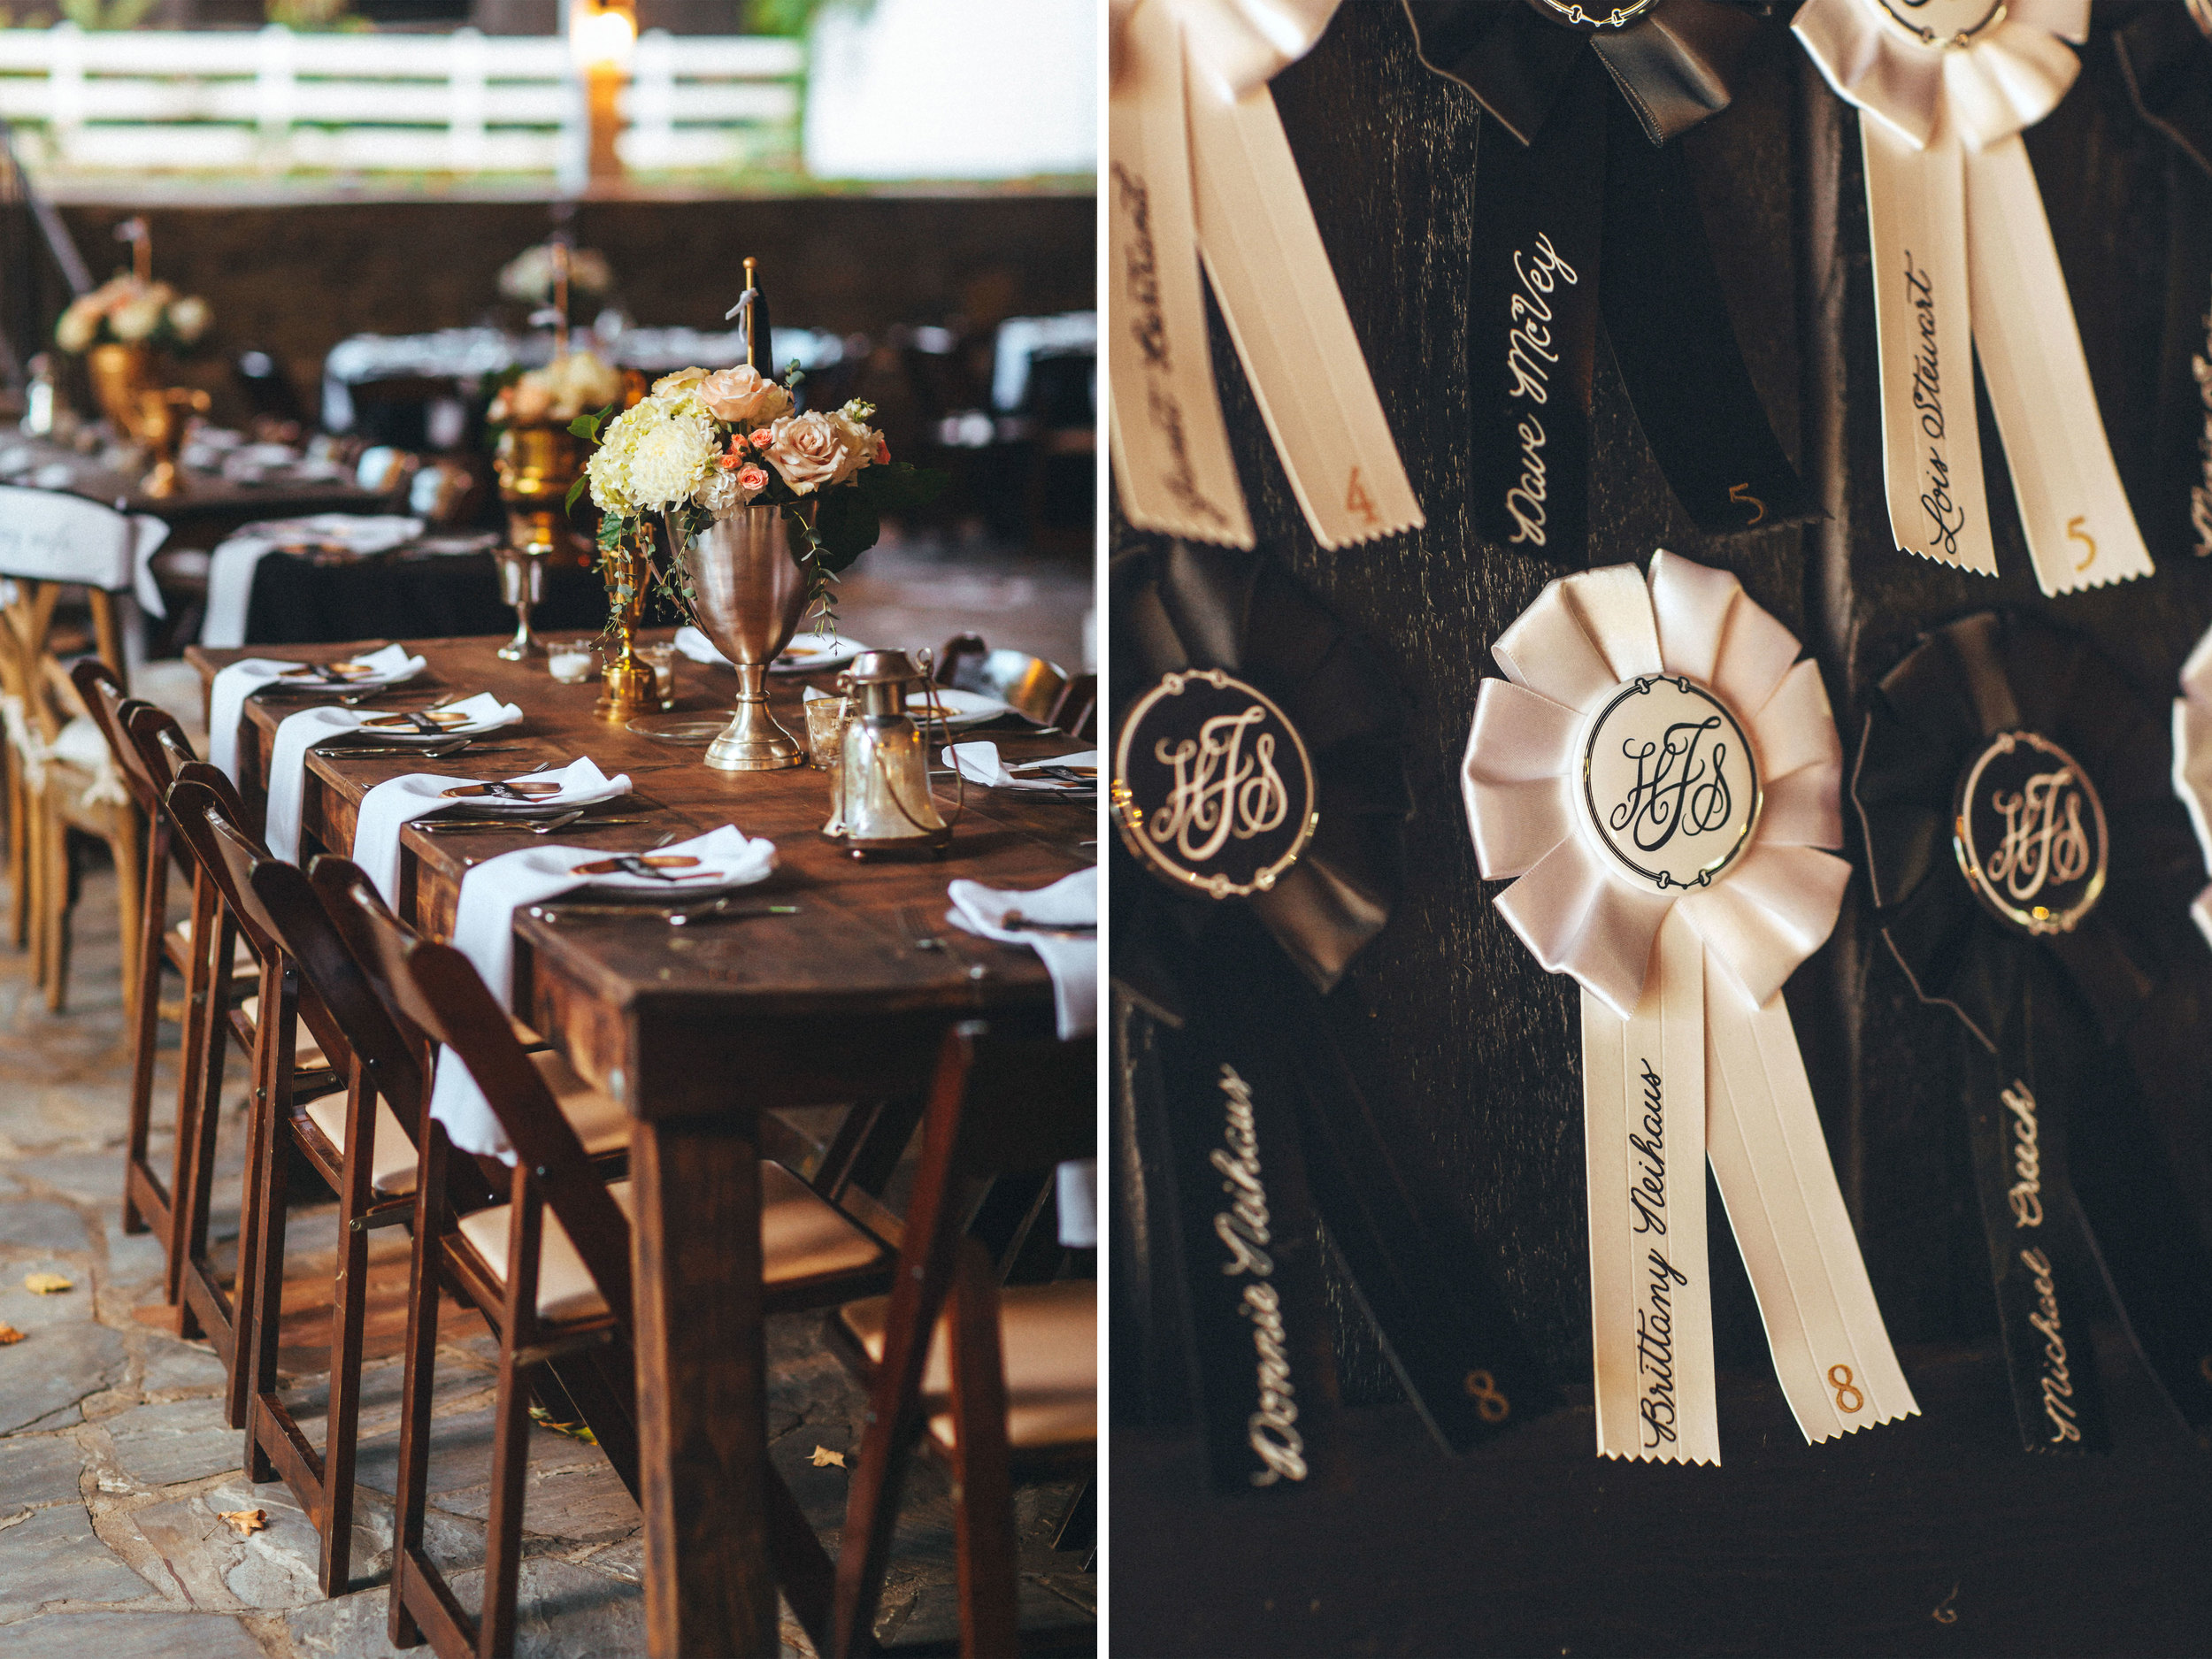 Me & Mr. Jones Wedding, Farm Tables, Gold Wedding, Black Tie Wedding, DIY Rosette Escort Cards, Equestrian Inspired Wedding Decor